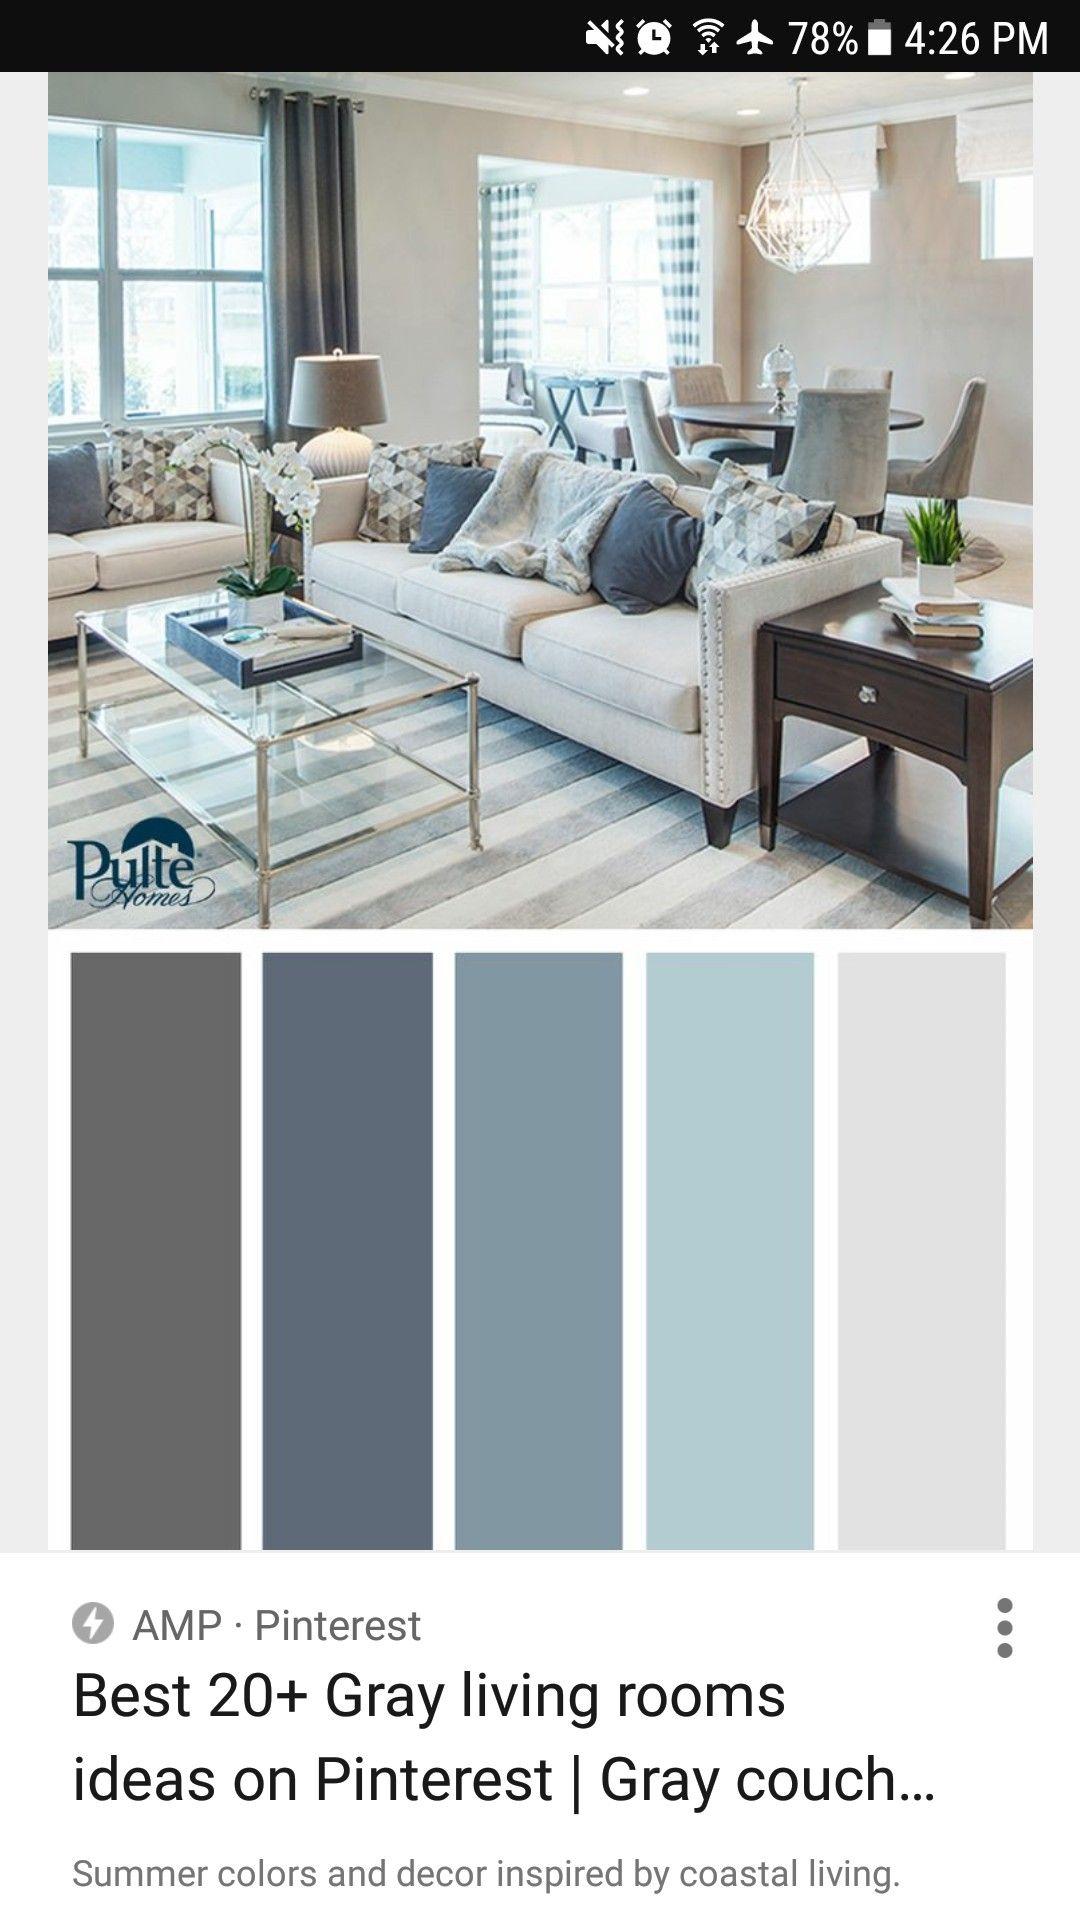 Pin By Daya Ja On Decor Living Room Colors Living Room Color Schemes Living Room Designs